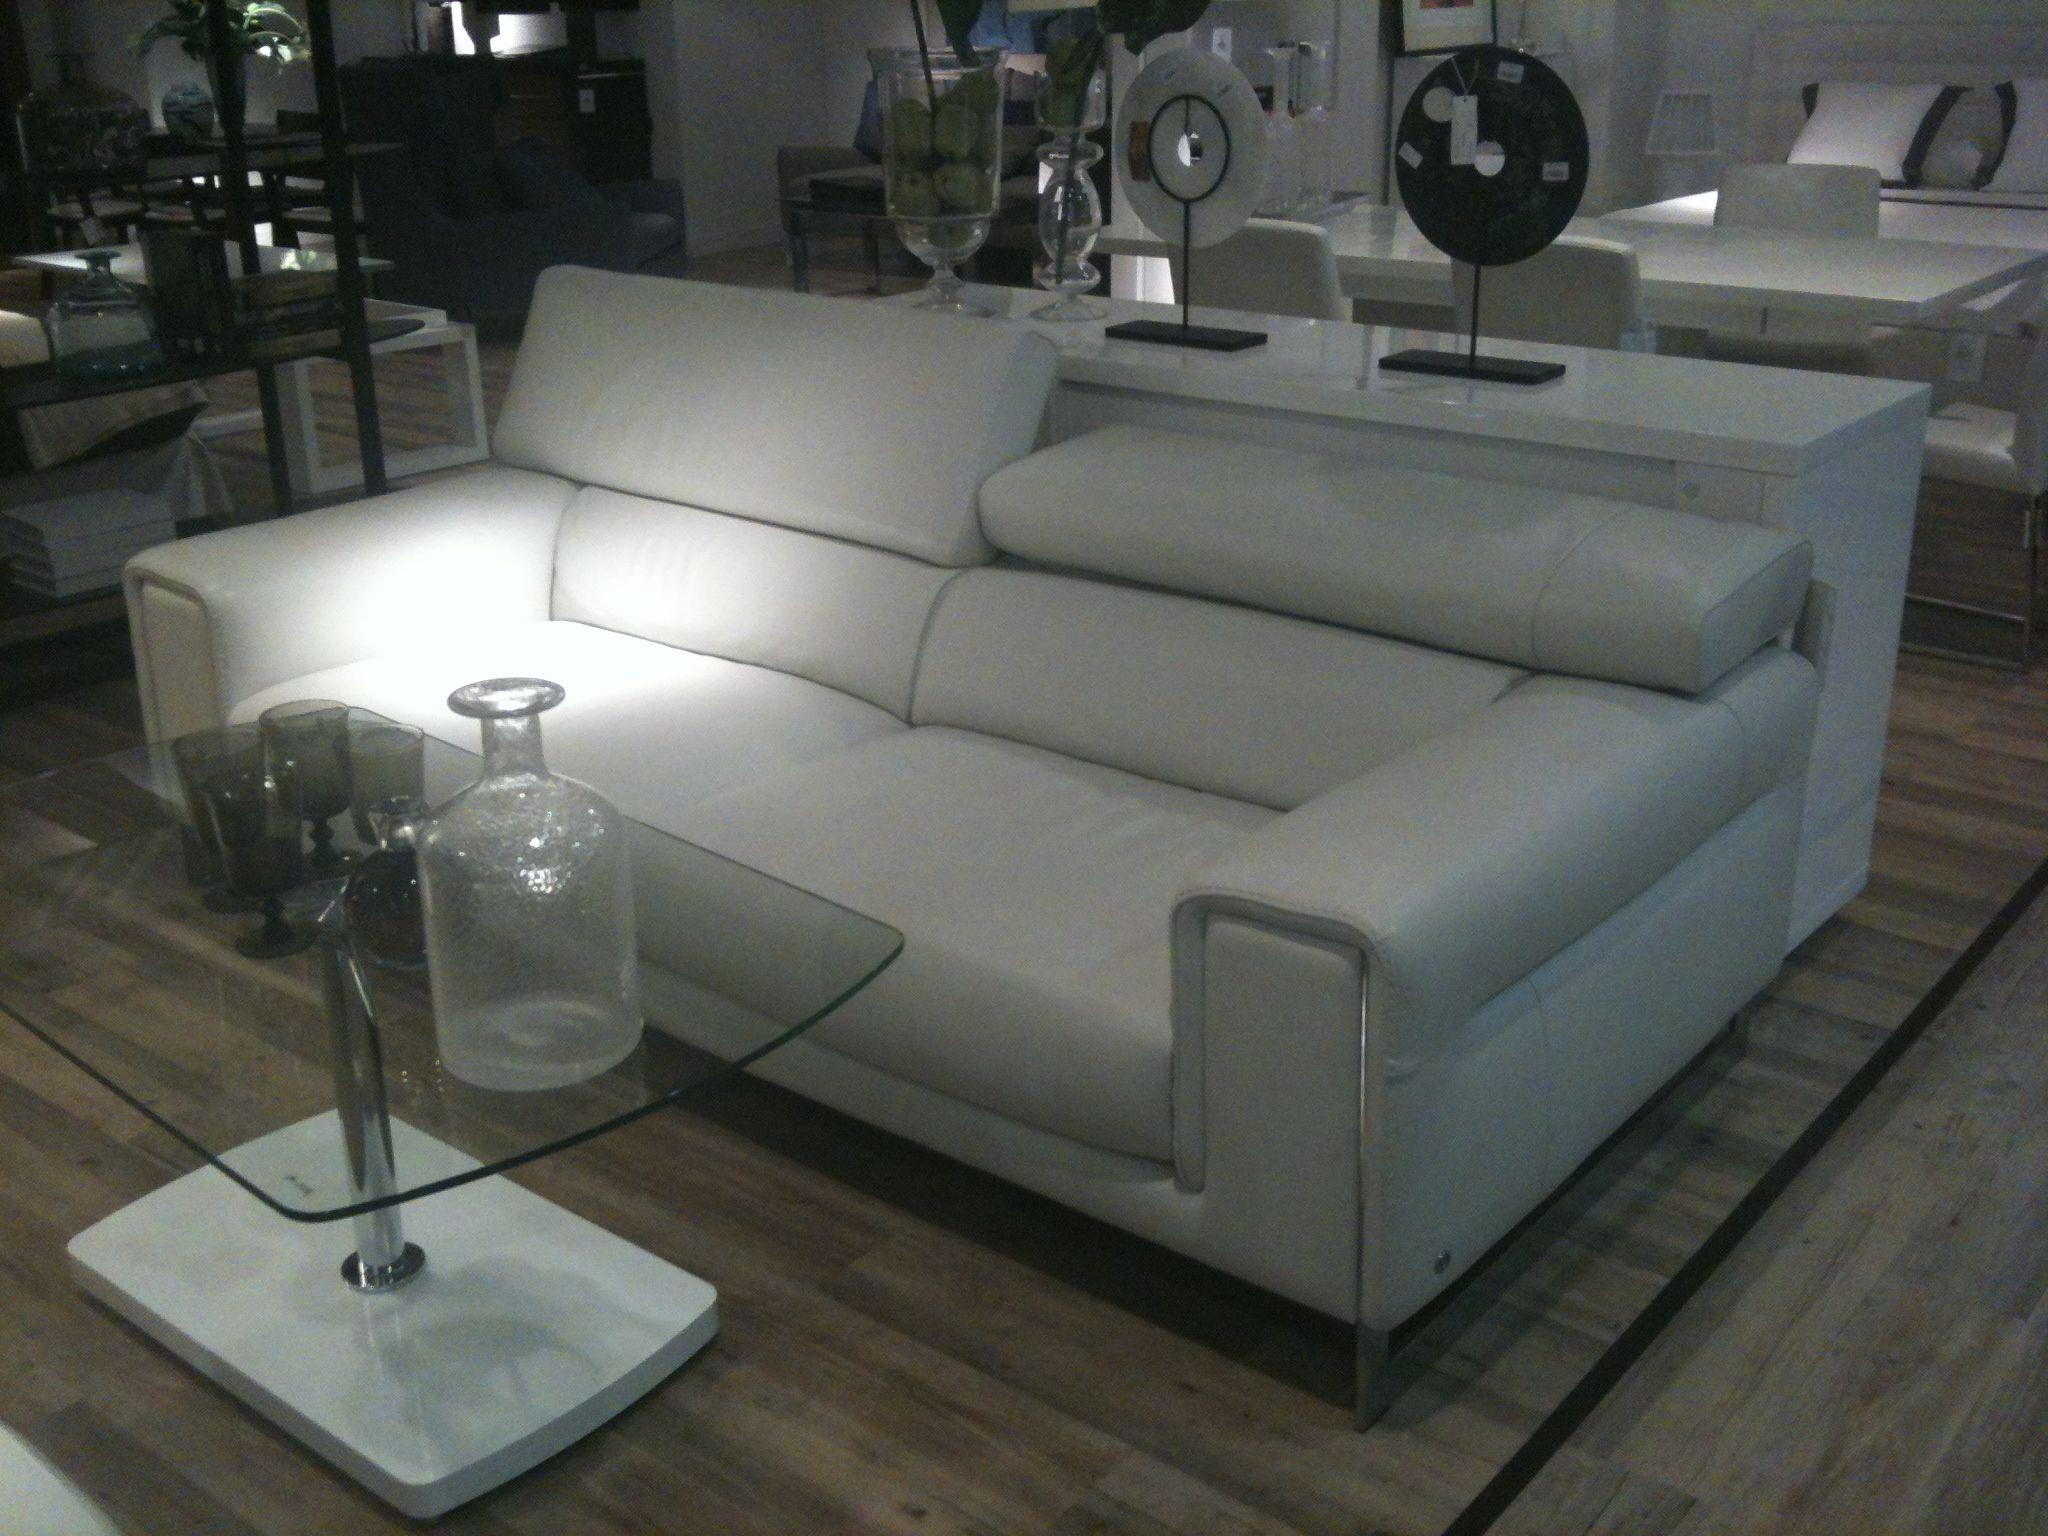 Sofa de natuzzi en el corte ingles muebles pinterest for Reposapies oficina ikea